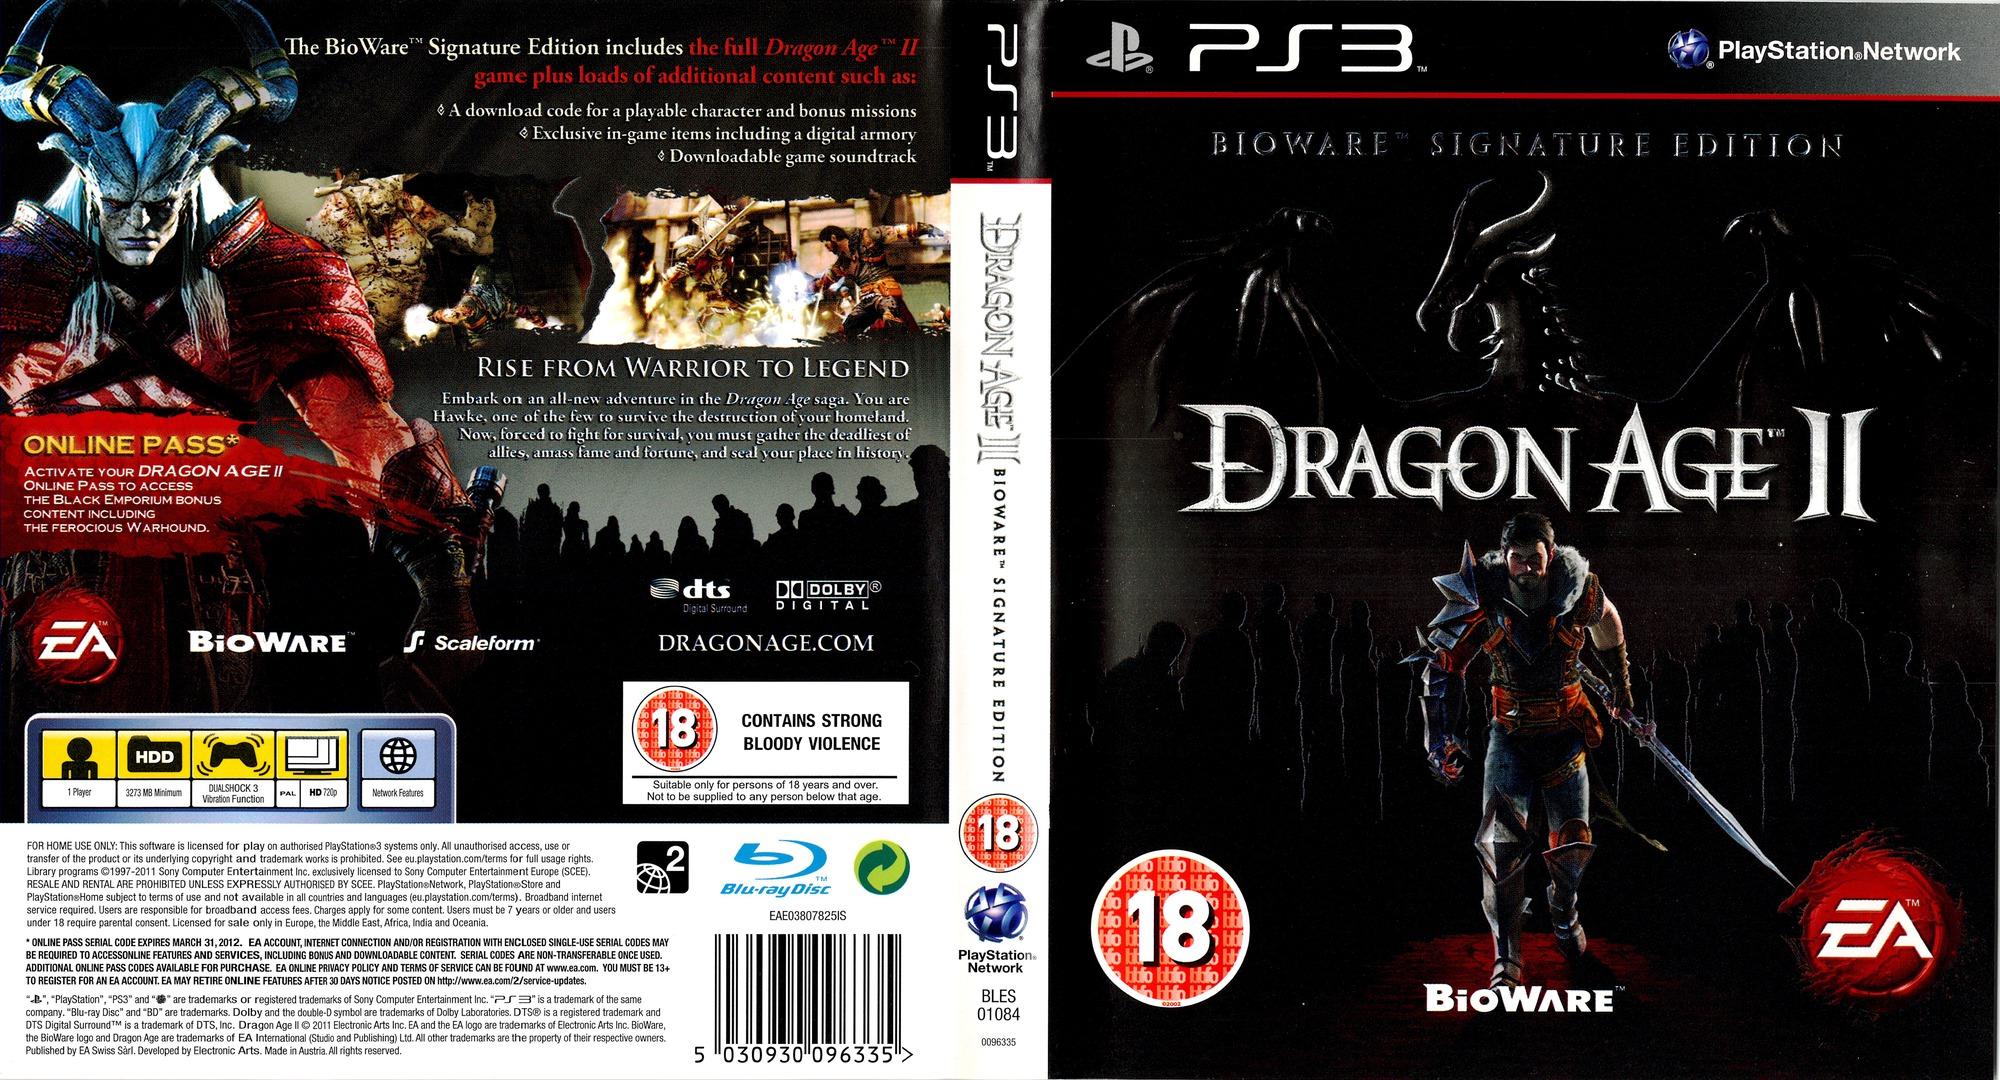 Dragon Age II (Bioware Signature Edition) PS3 coverfullHQ (BLES01084)